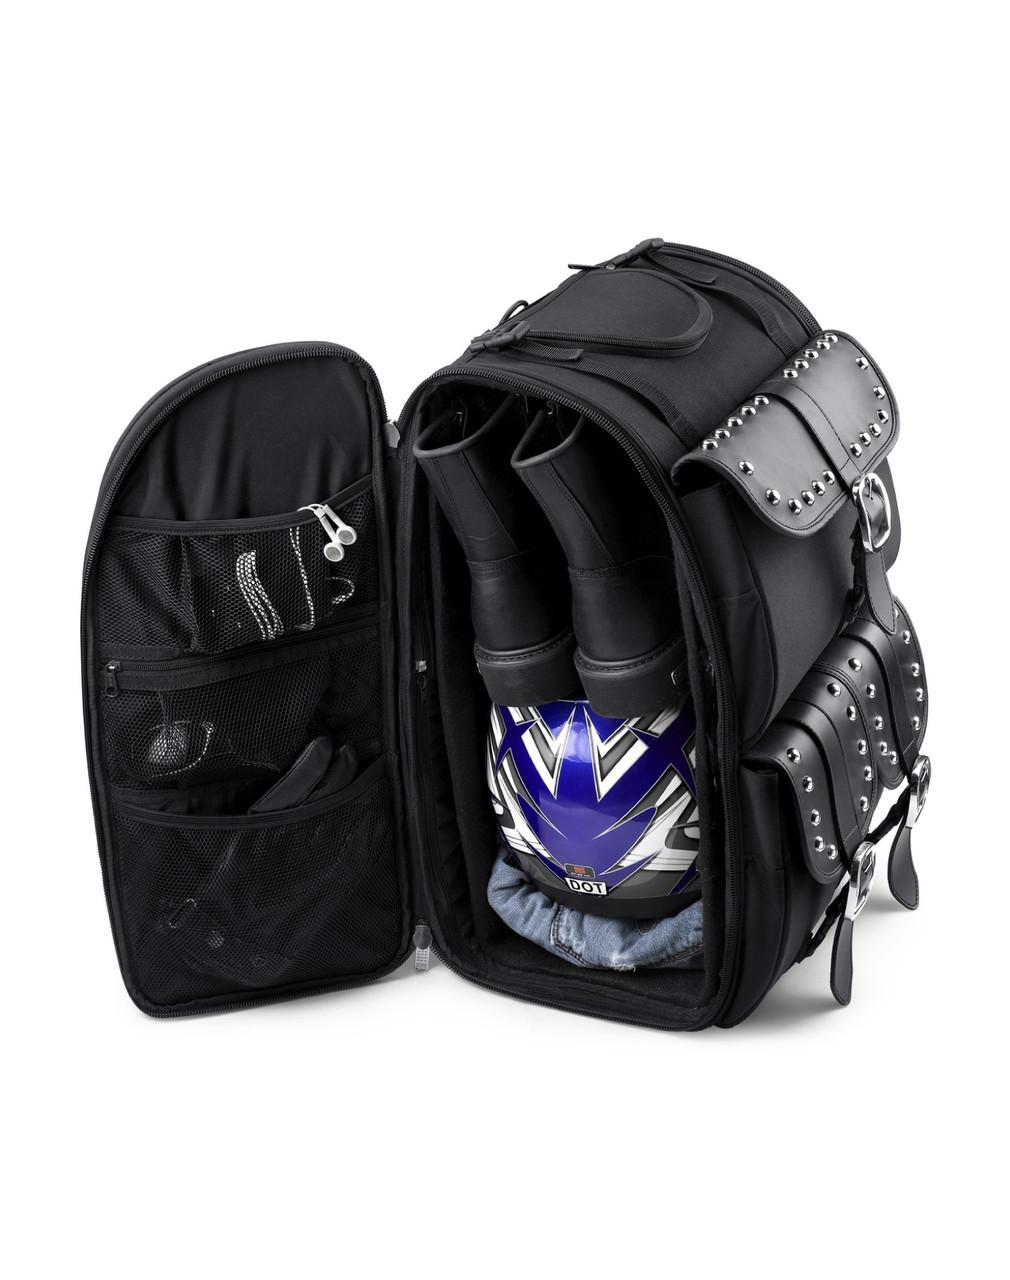 Suzuki Viking Extra Large Studded Motorcycle Sissy Bar Bag Storage View